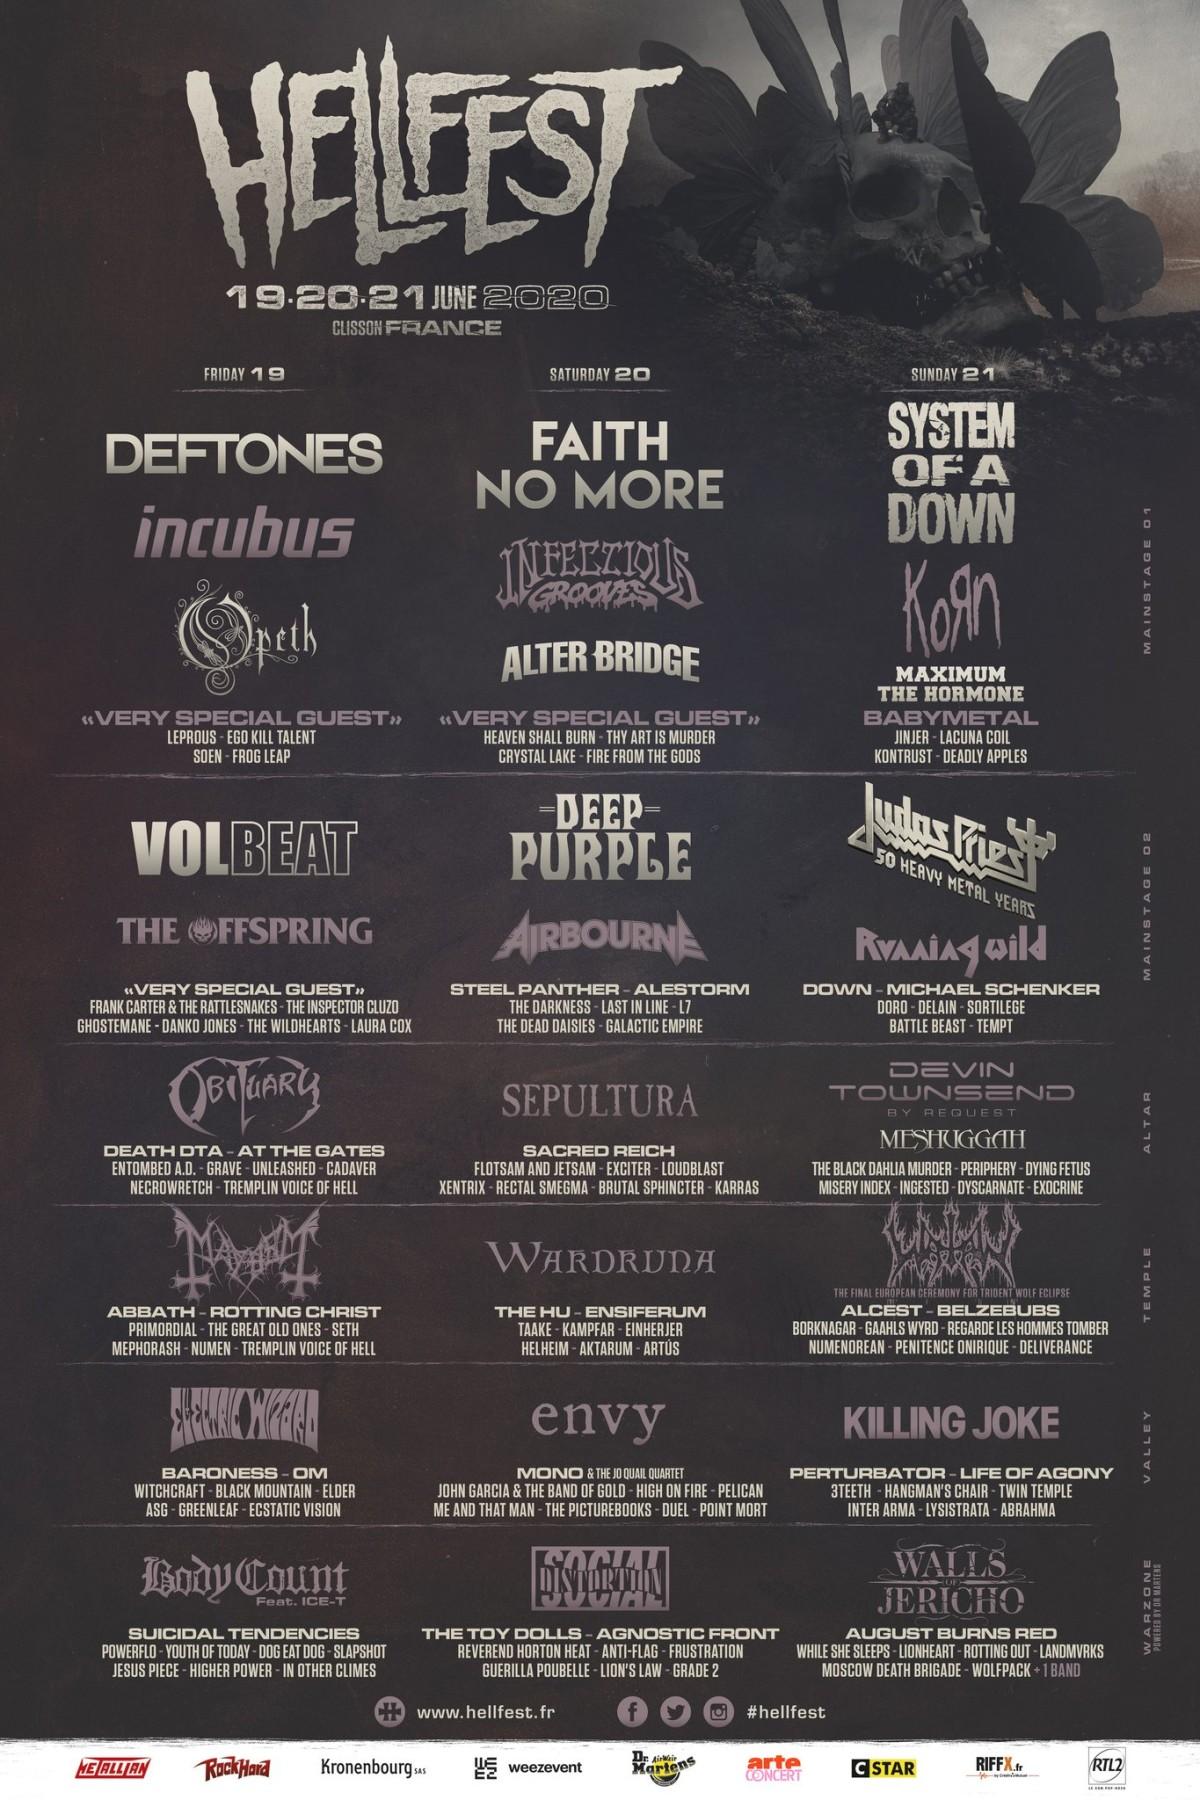 Hellfest lineup